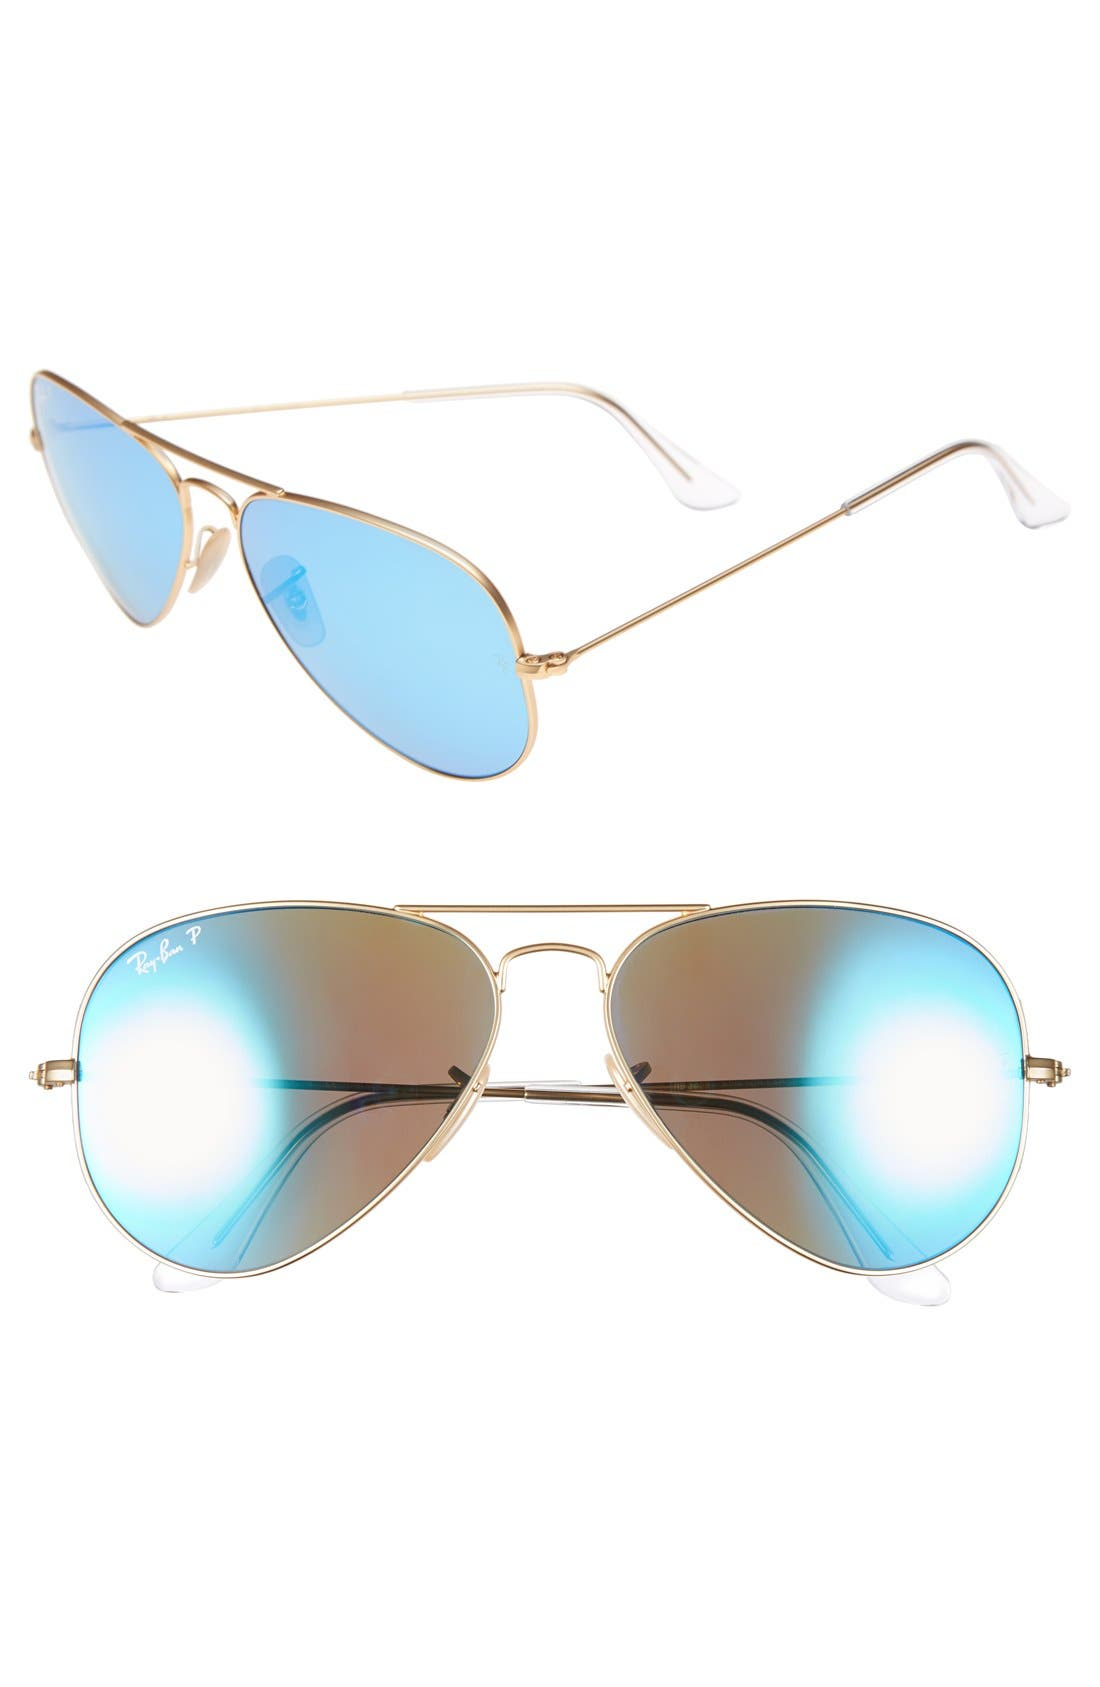 Ray-Ban Standard Icons 5m Mirrored Polarized Aviator Sunglasses -